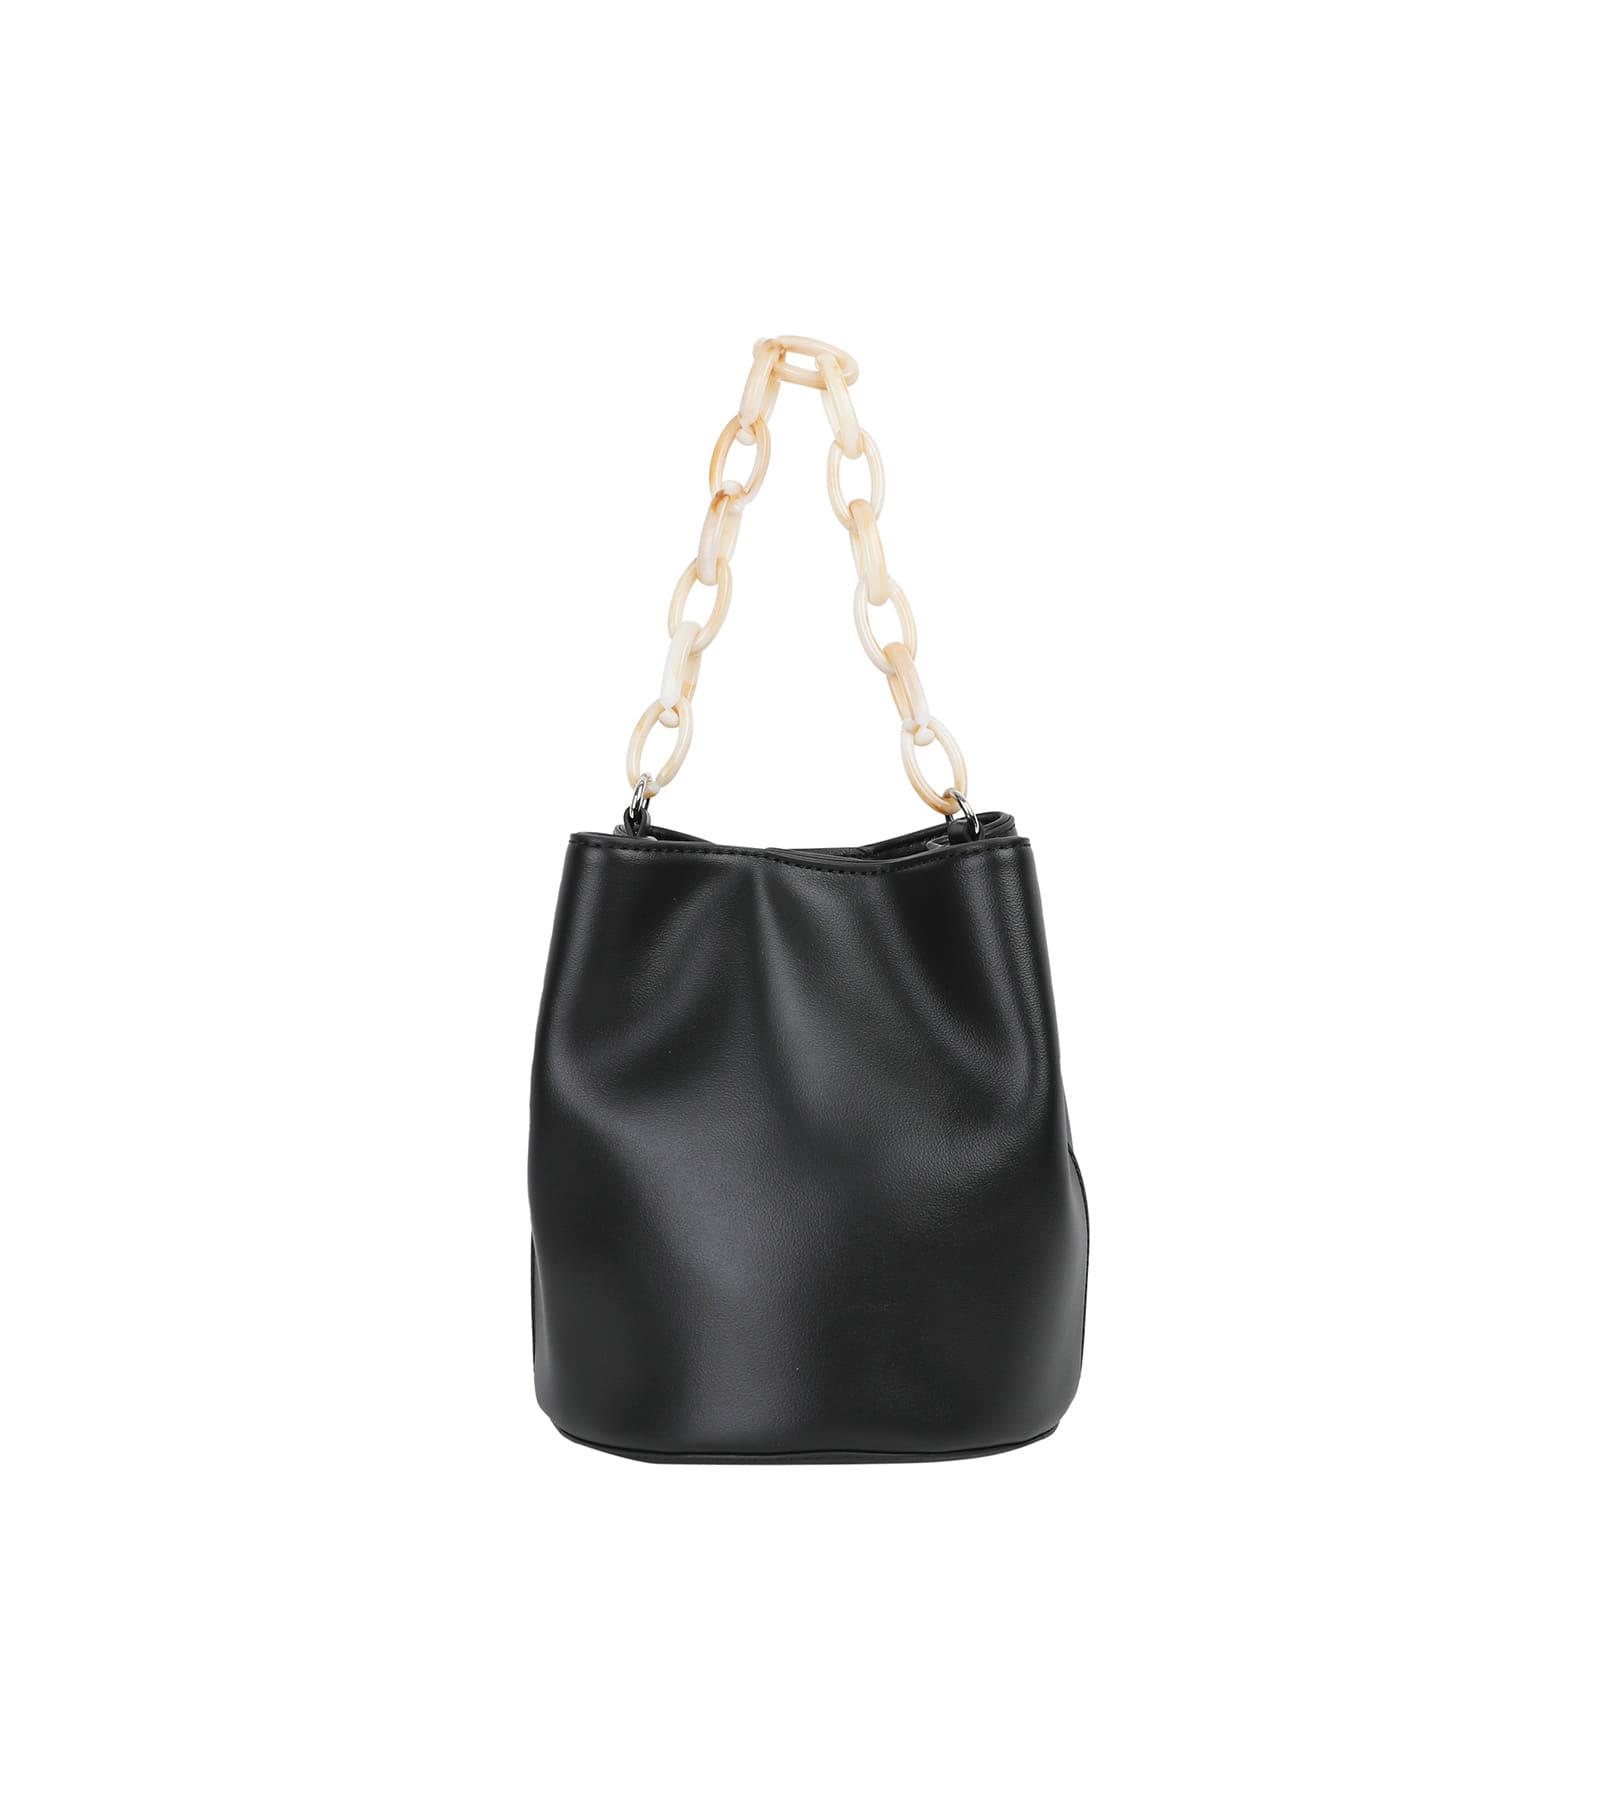 Dave chain bucket shoulder bag